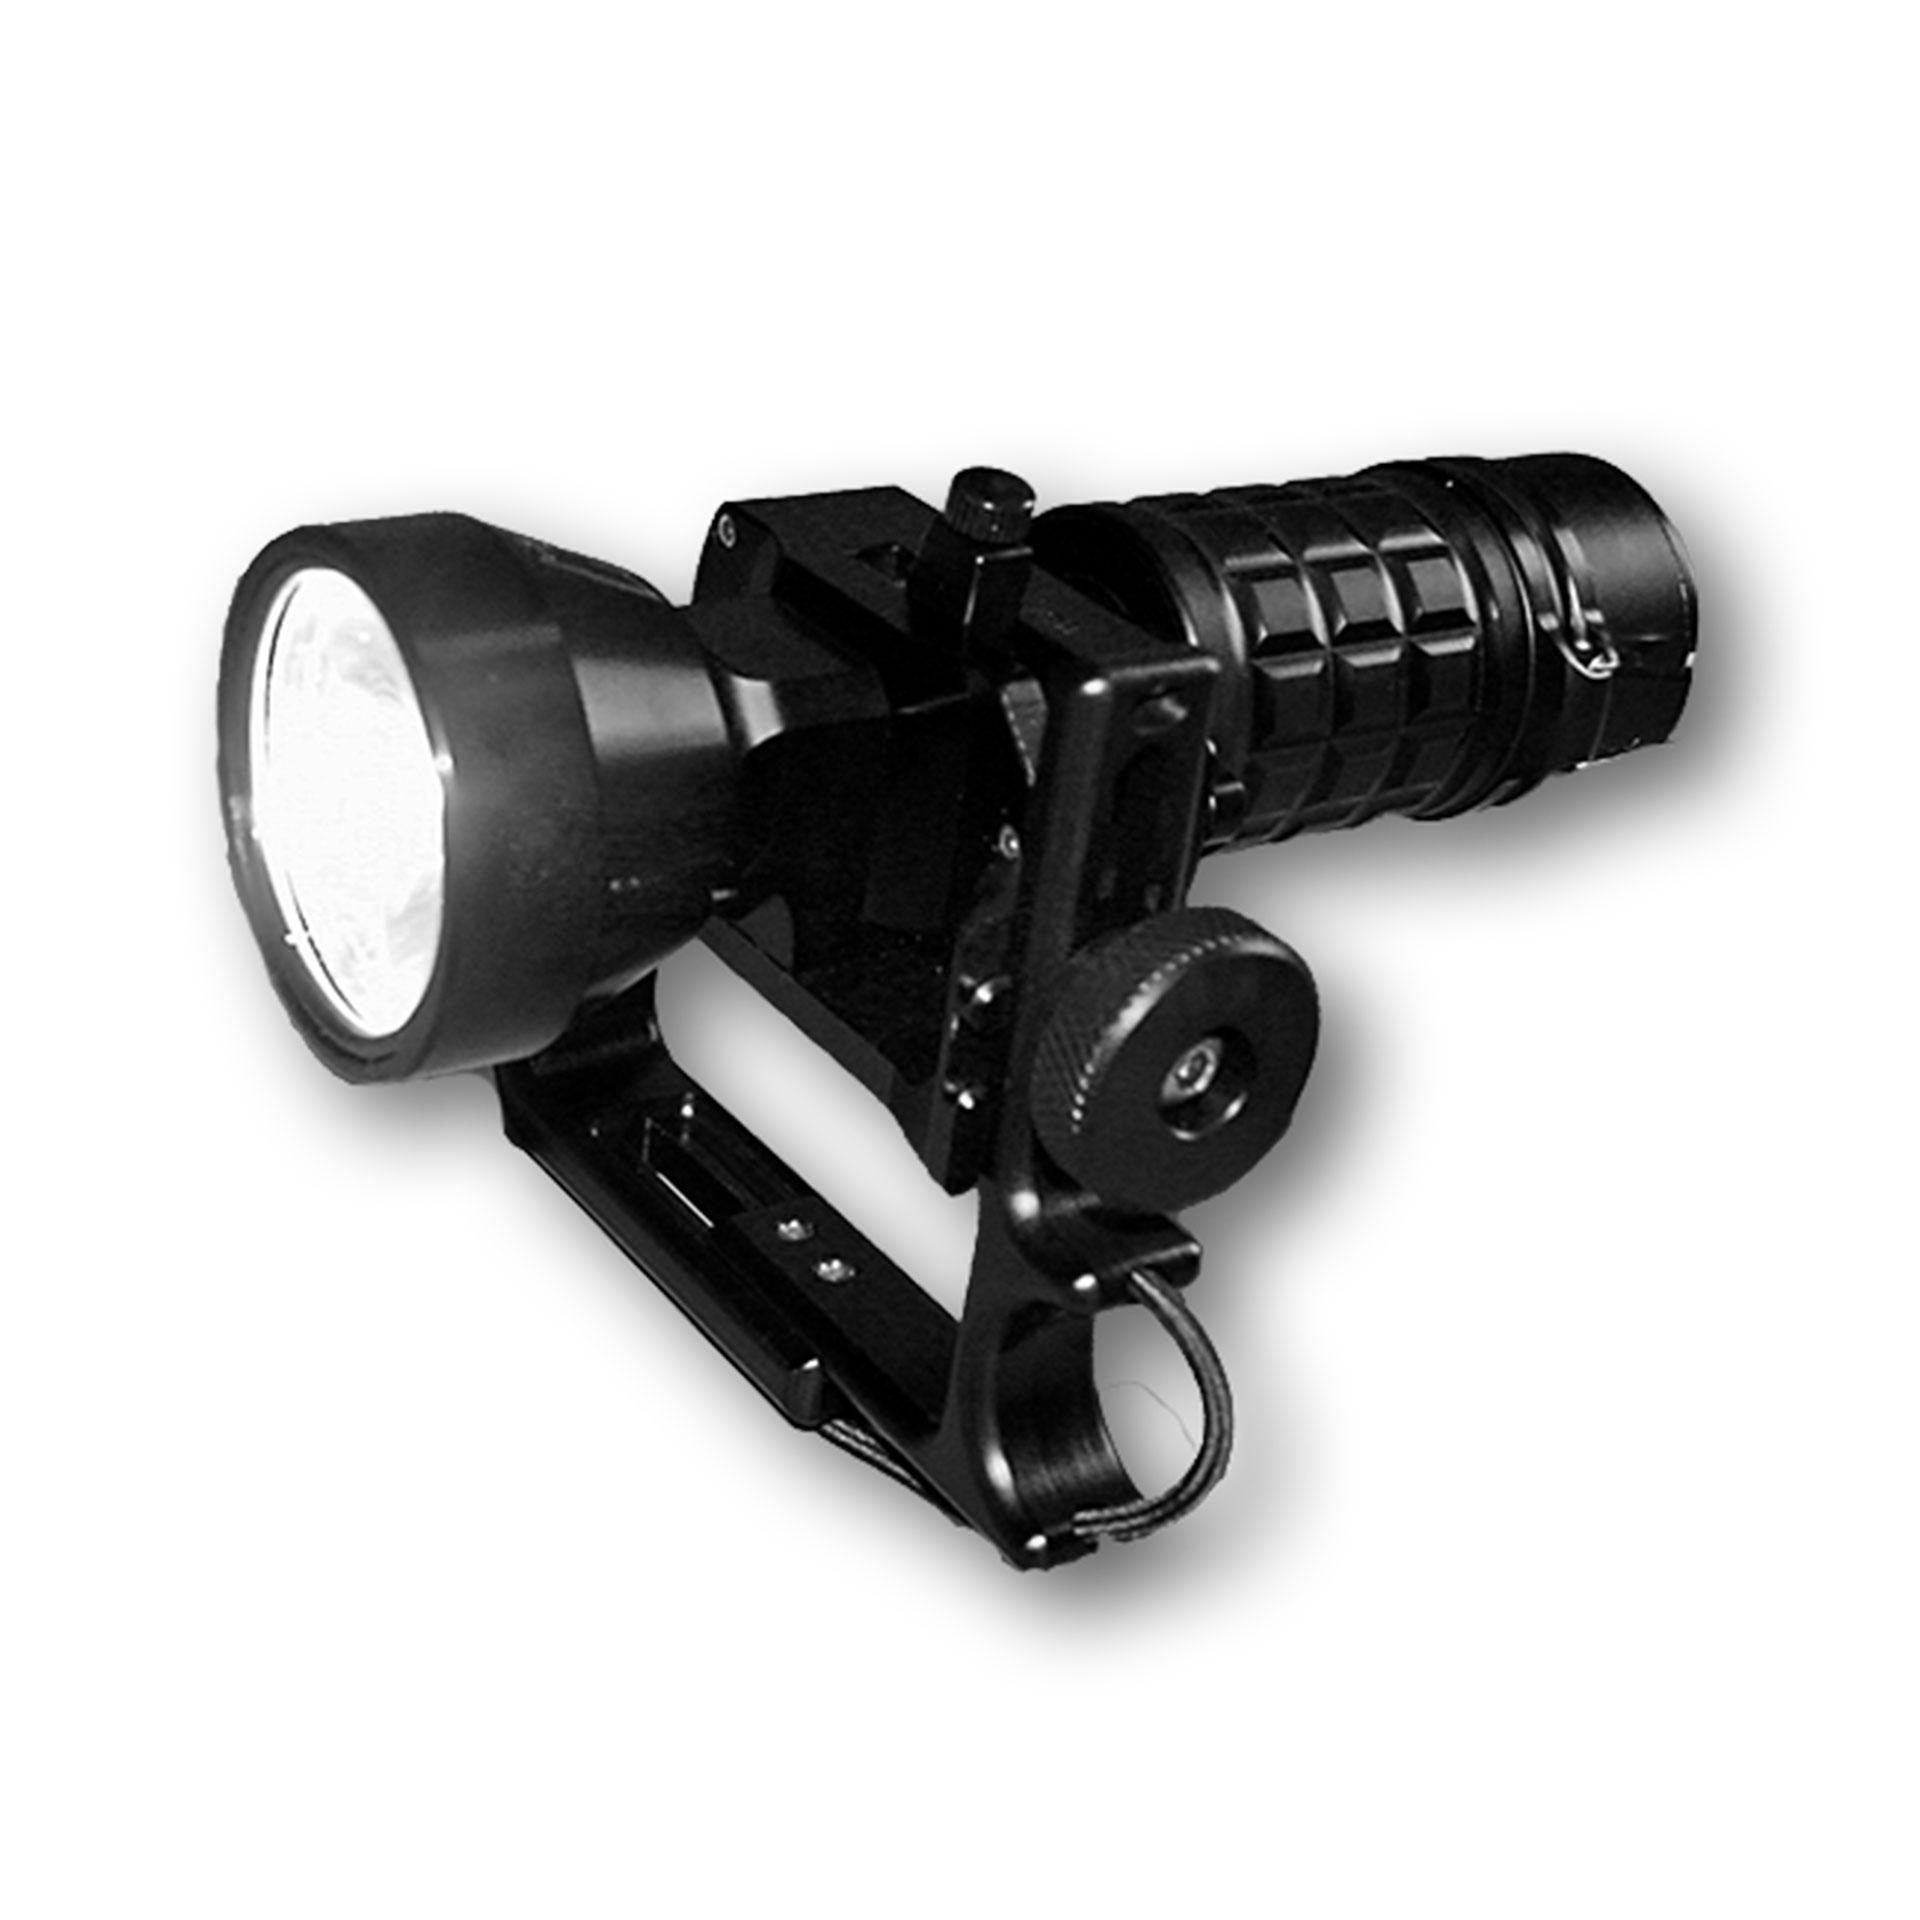 Flare Primary Light – Handheld